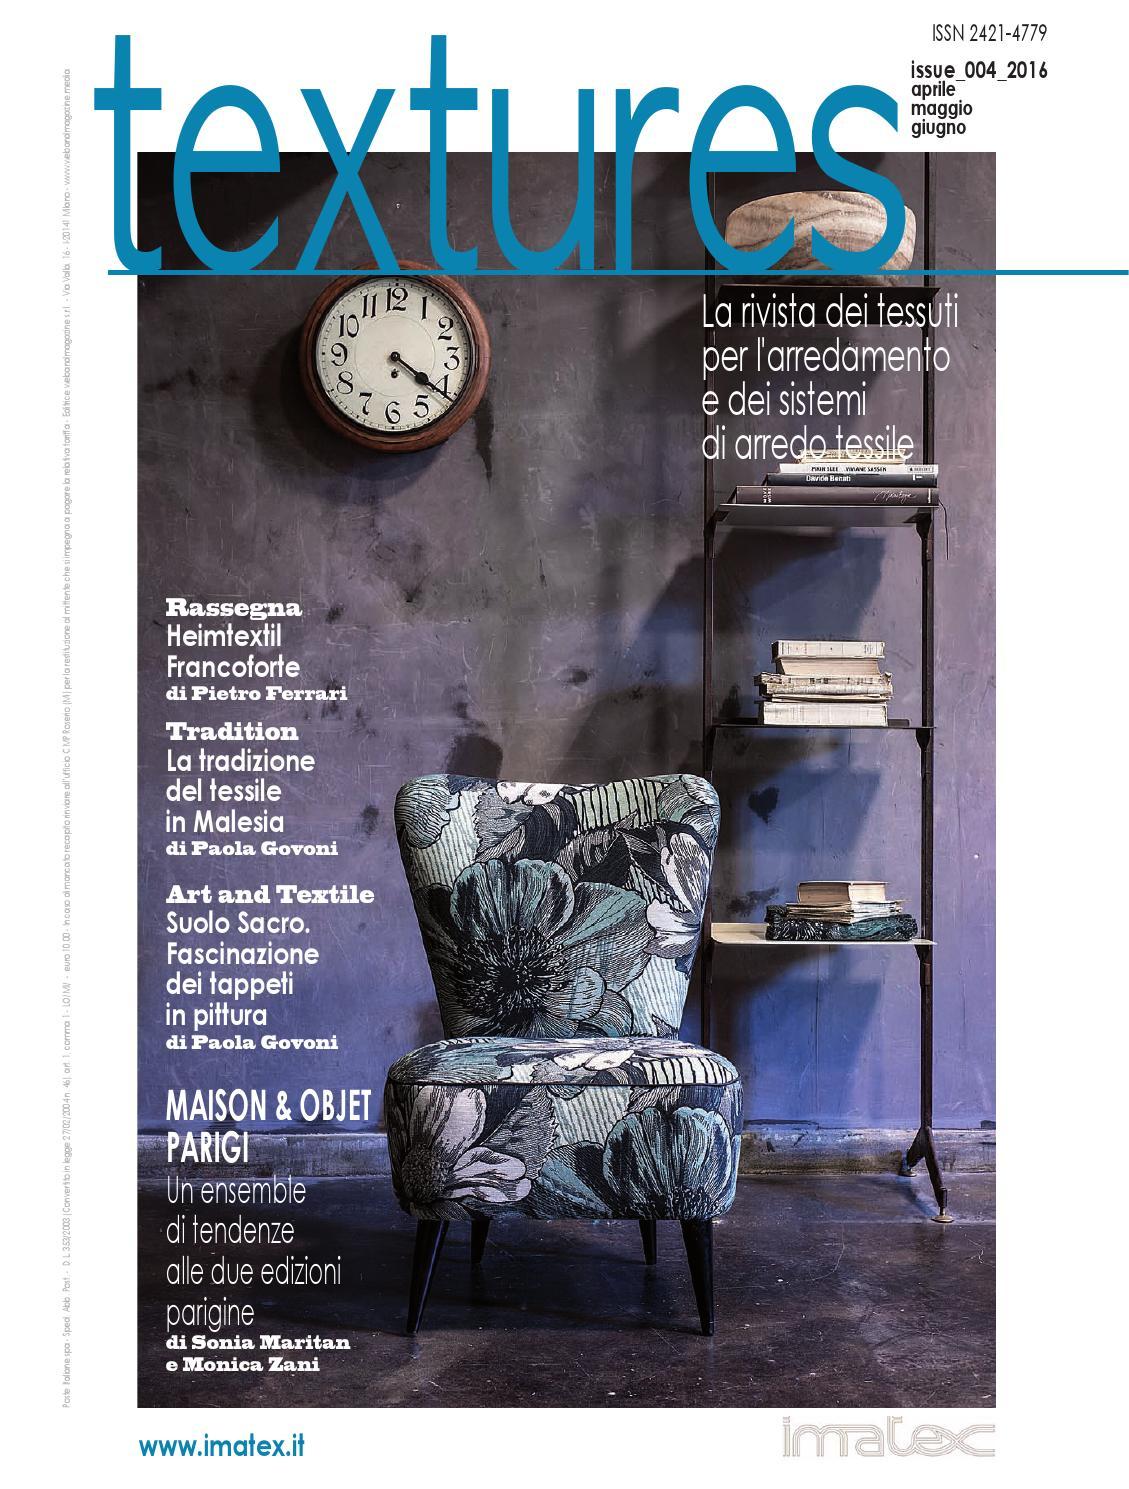 Home italia Marzo 2014 by edinterni srl - issuu